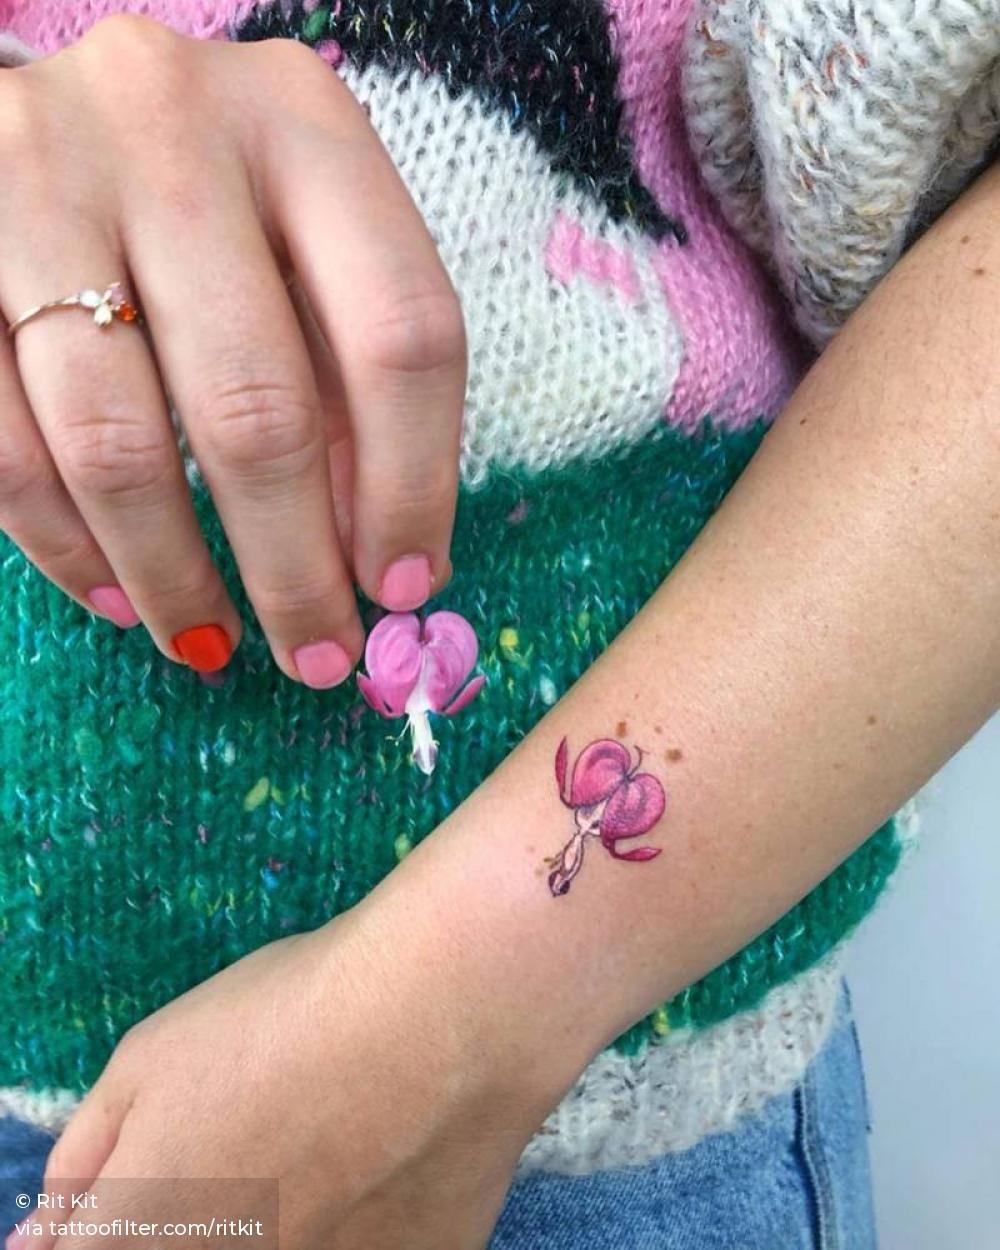 Tiny Alien Dicentra Flower Or Bleeding Heart In 2020 Heart Flower Tattoo Bleeding Heart Tattoo Tattoo Artists